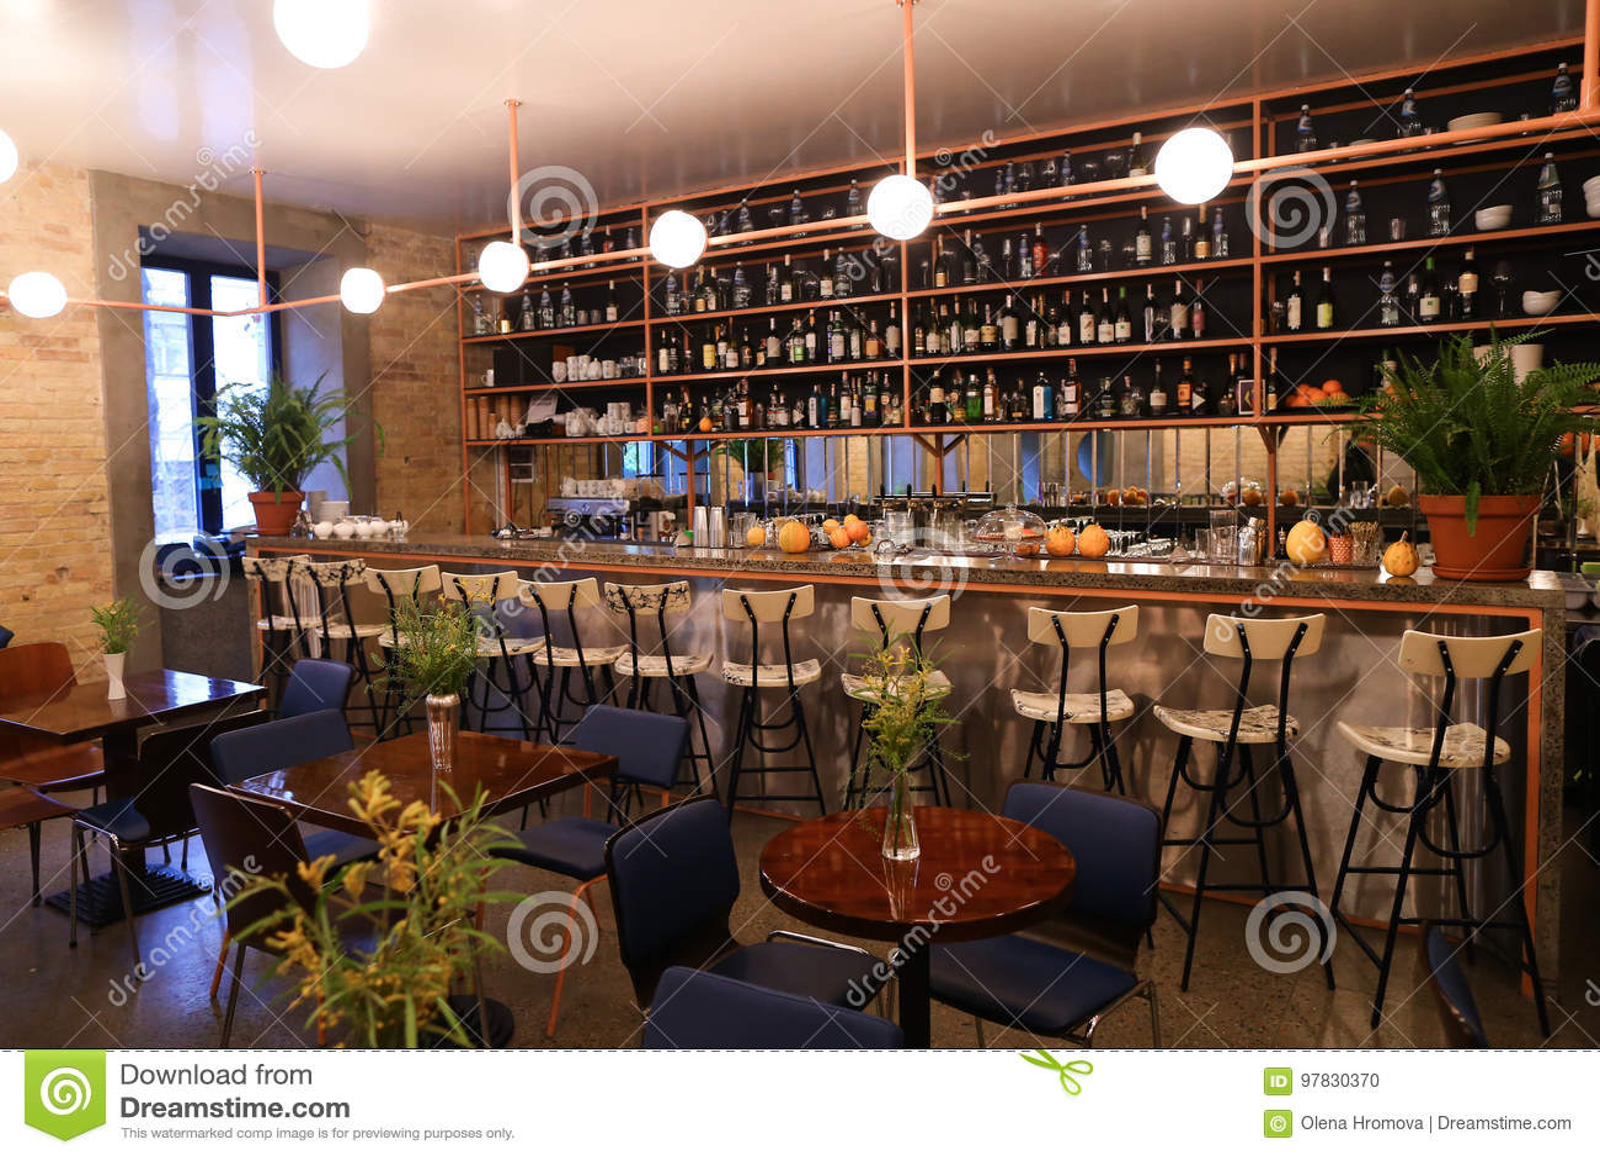 Capture Design Ideas Trendy Cafe Or Restaurant Because Bar Stock Photo Image Of Decor Beautiful 97830370